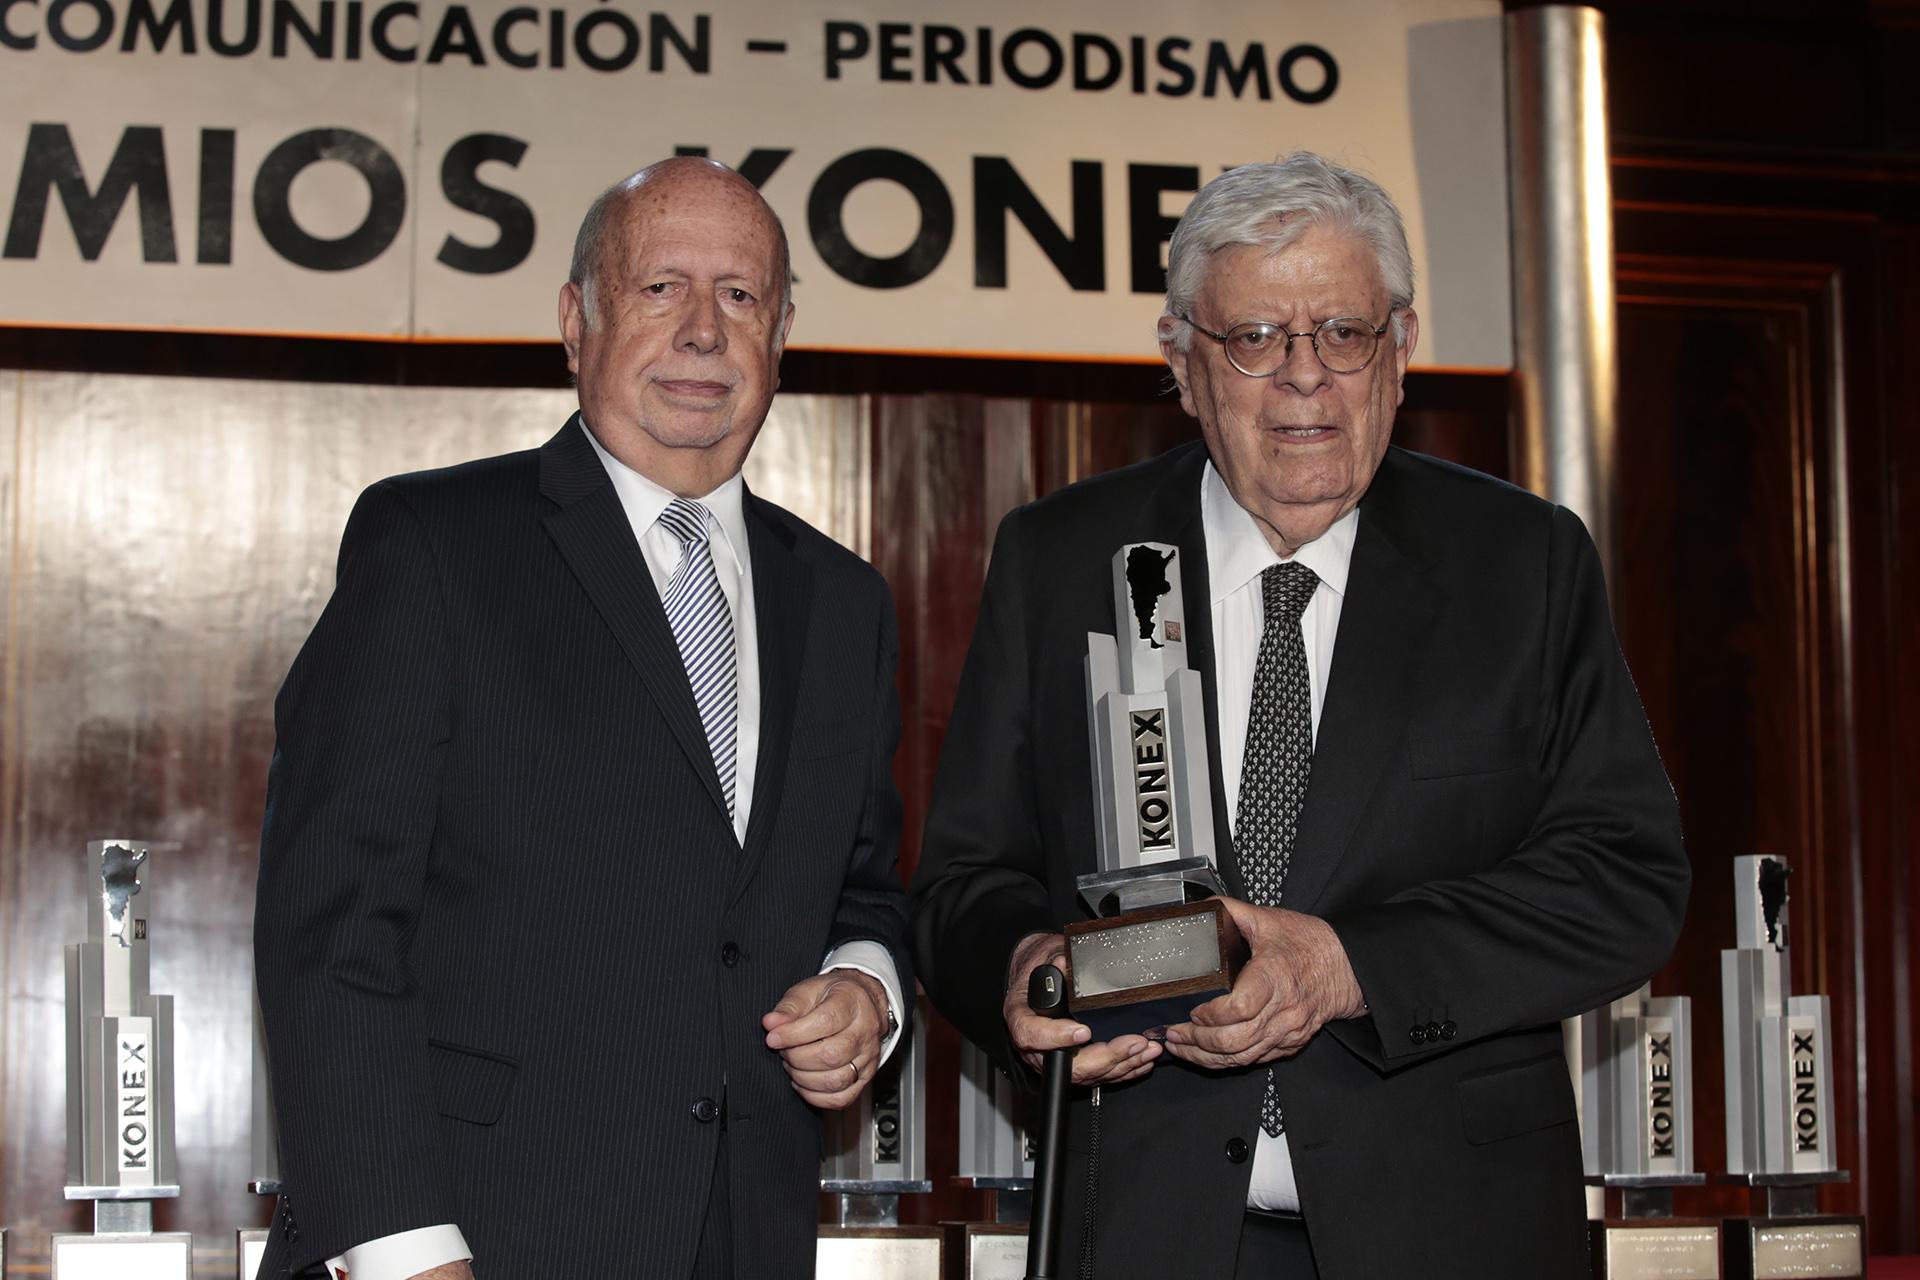 Jorge de Luján Gutiérrez entregó el Konex de Platino a Hermenegildo Sábat en la categoría Humor